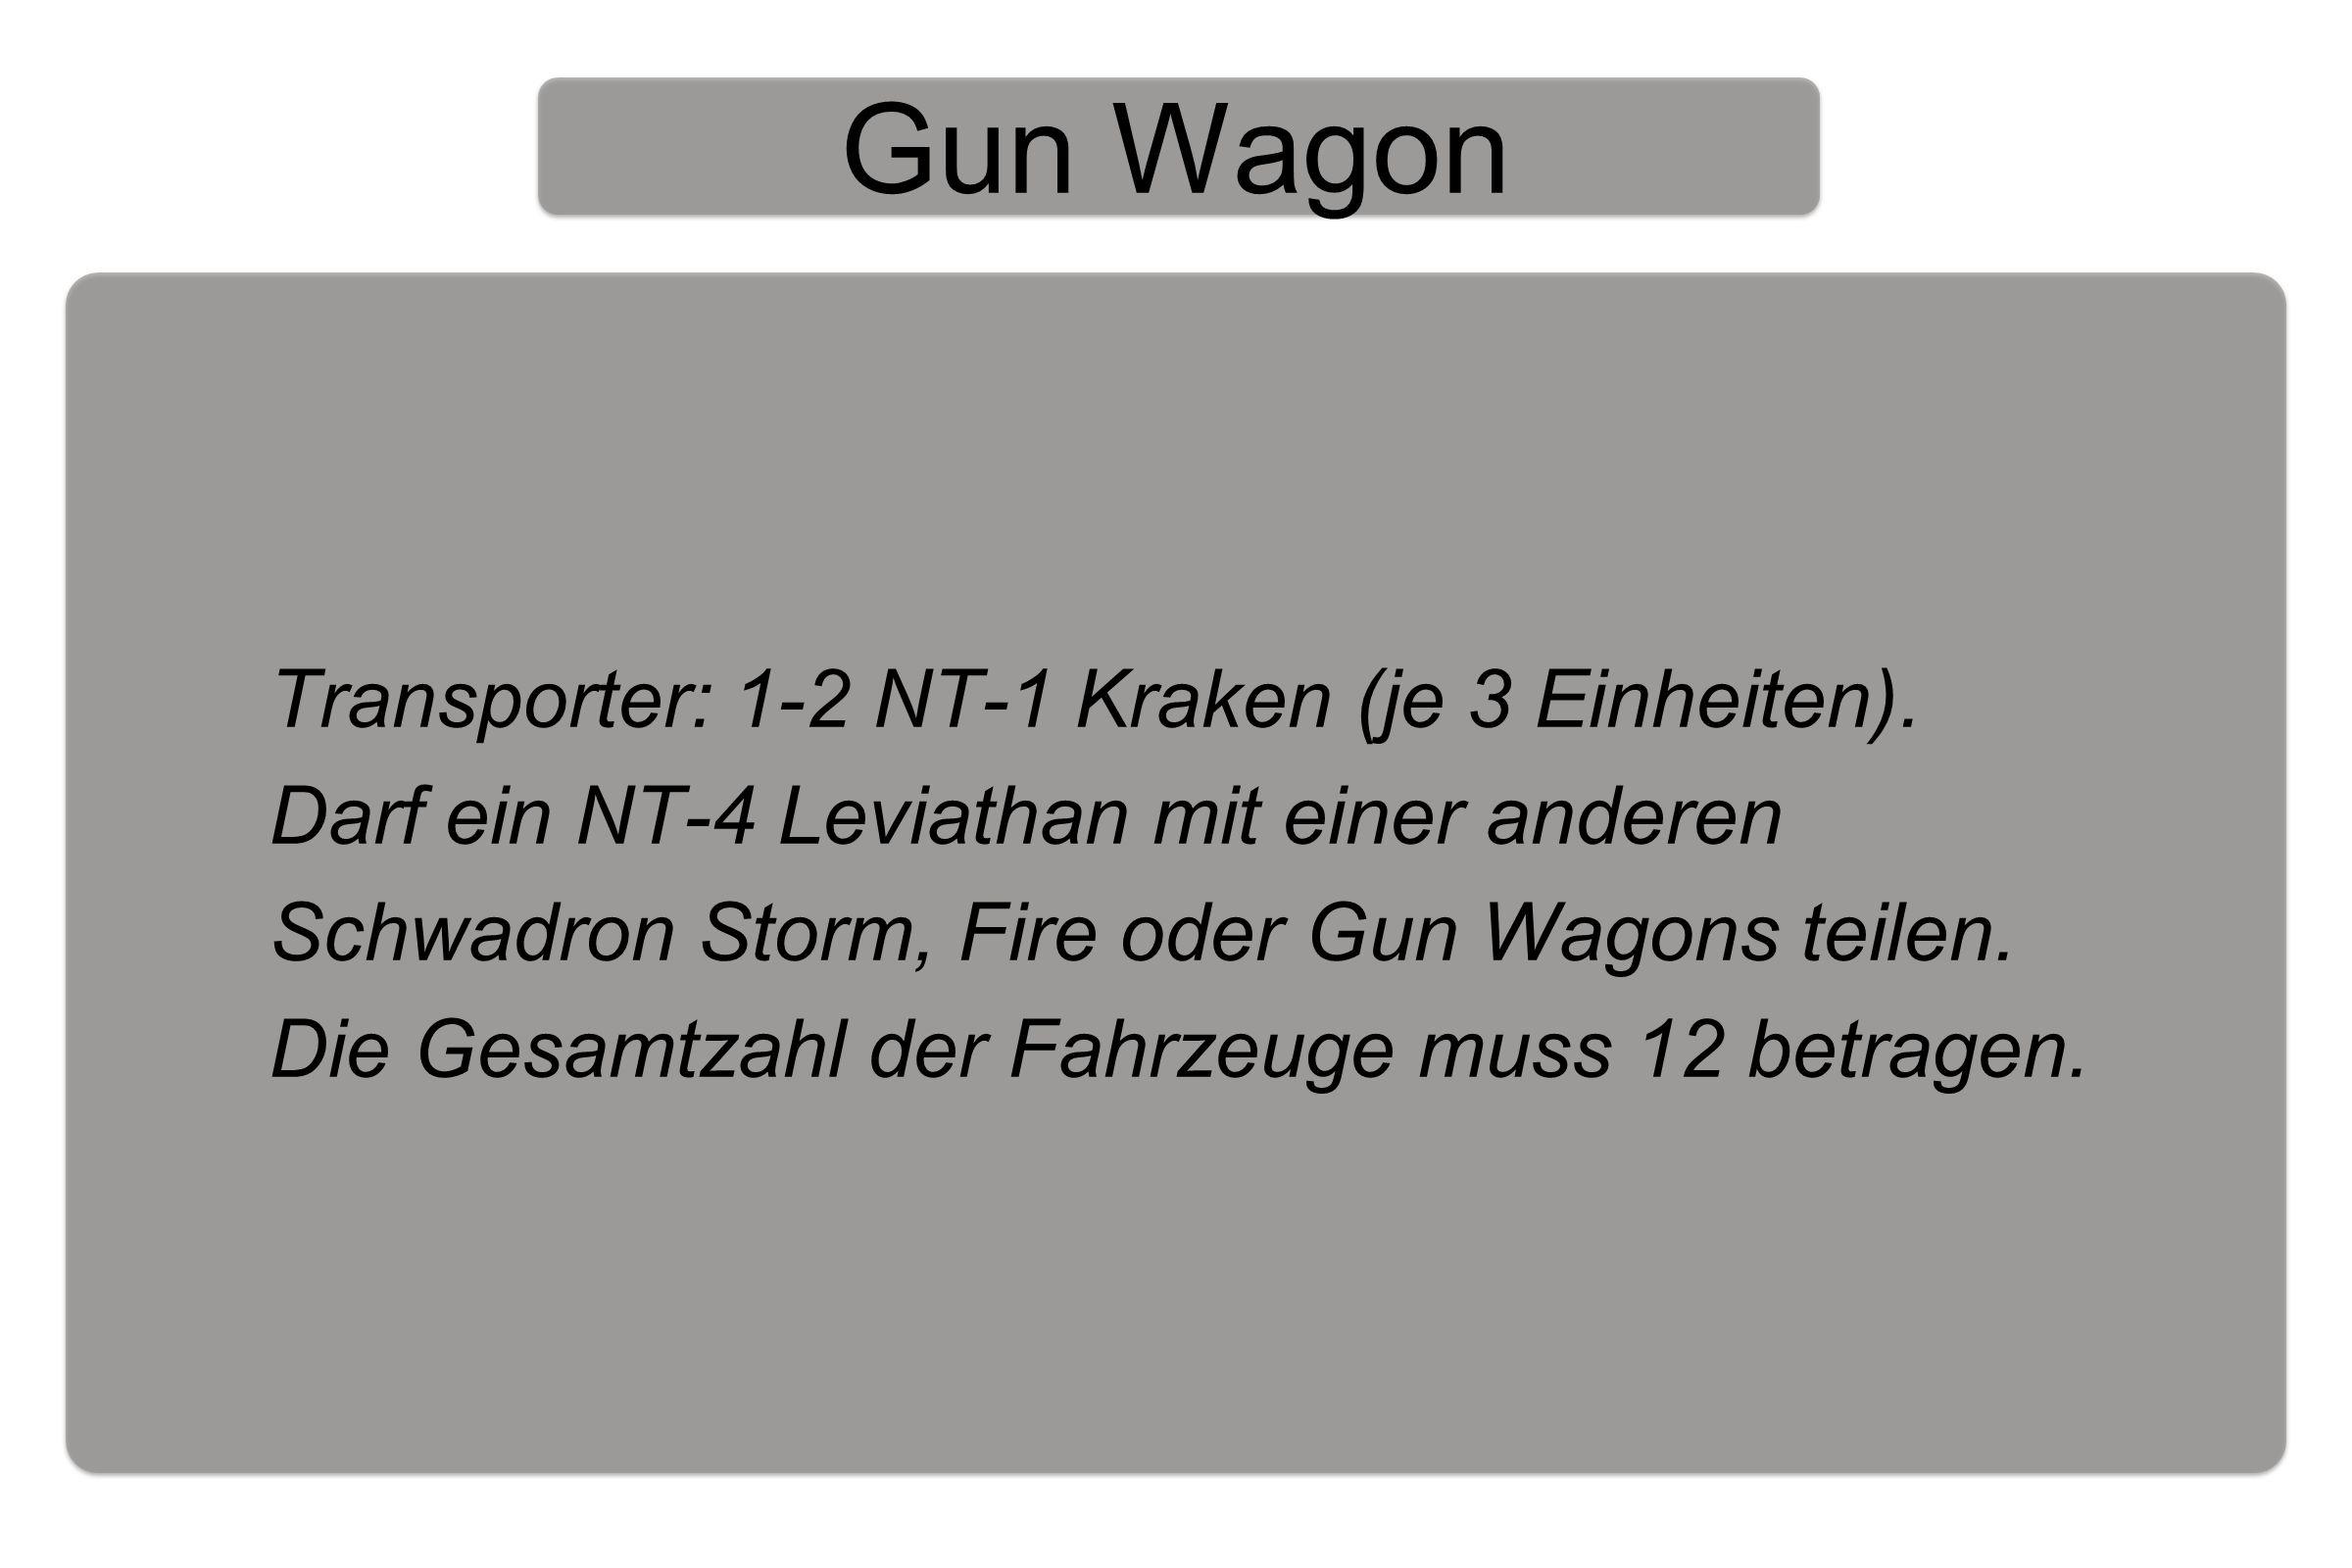 Gun Wagon Transporter: 1-2 NT-1 Kraken (je 3 Einheiten).